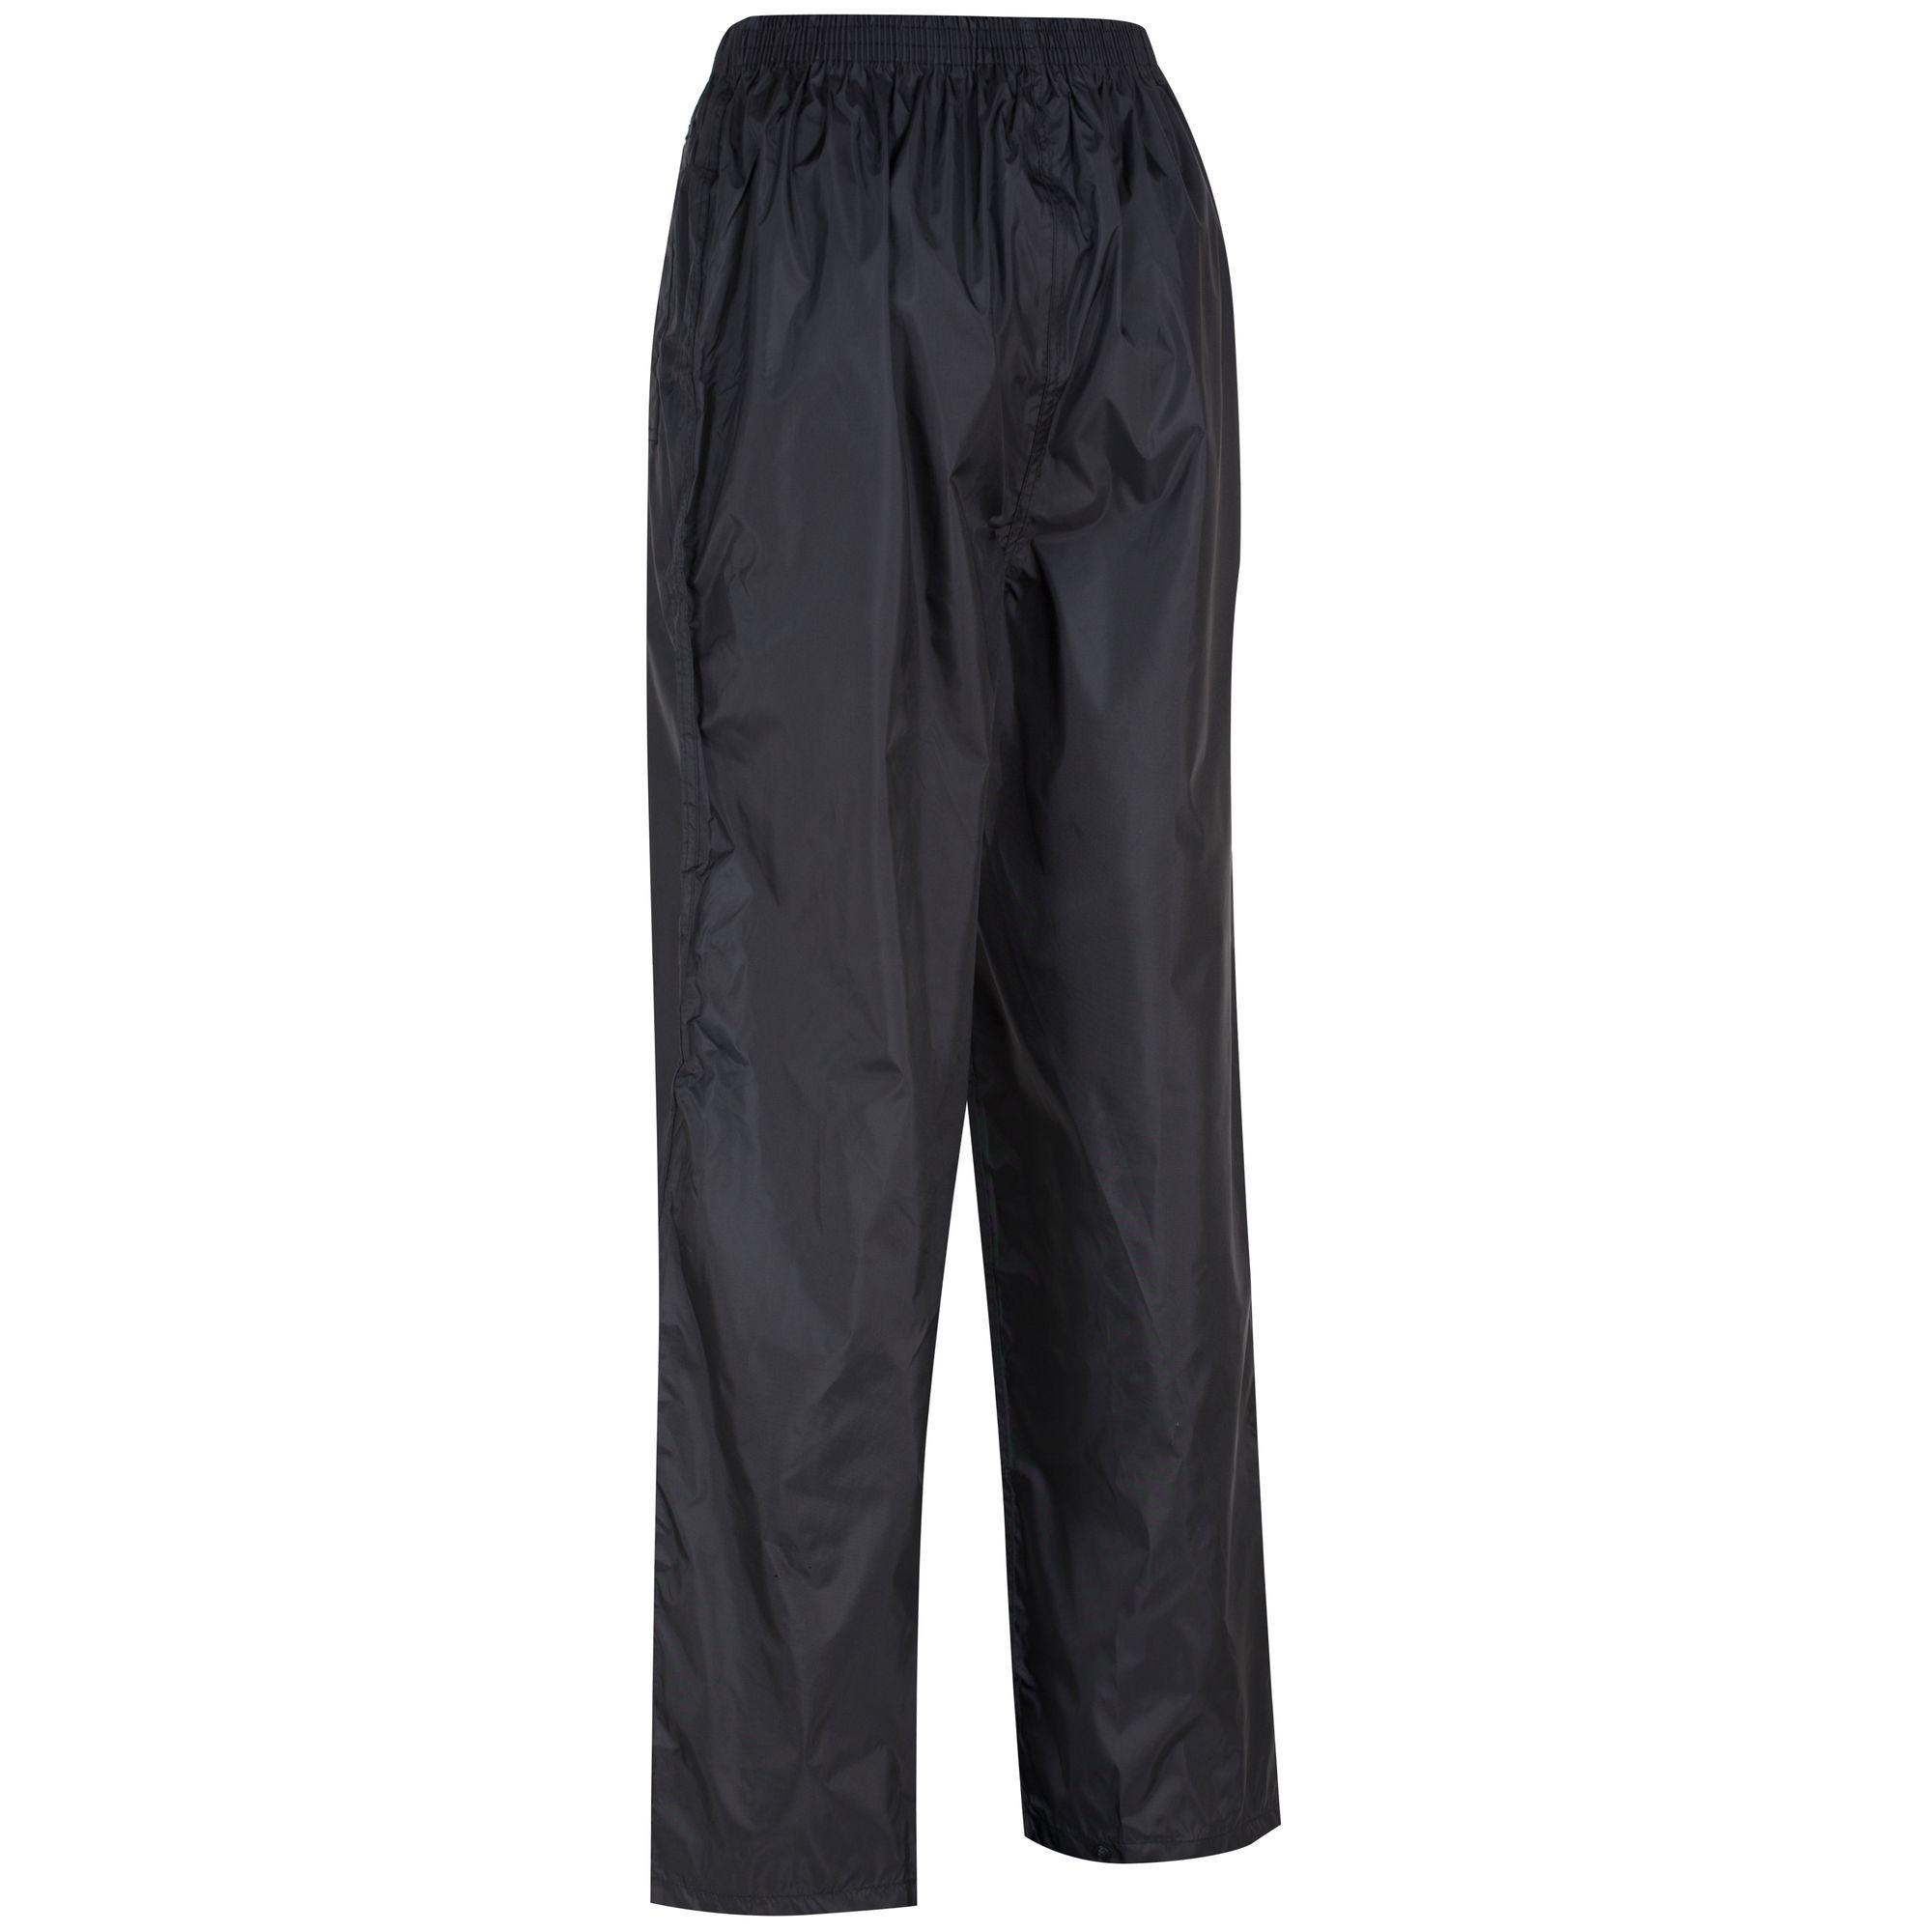 Regatta Great Outdoors Womens/Ladies Adventure Tech Pack It Waterproof Overtrousers